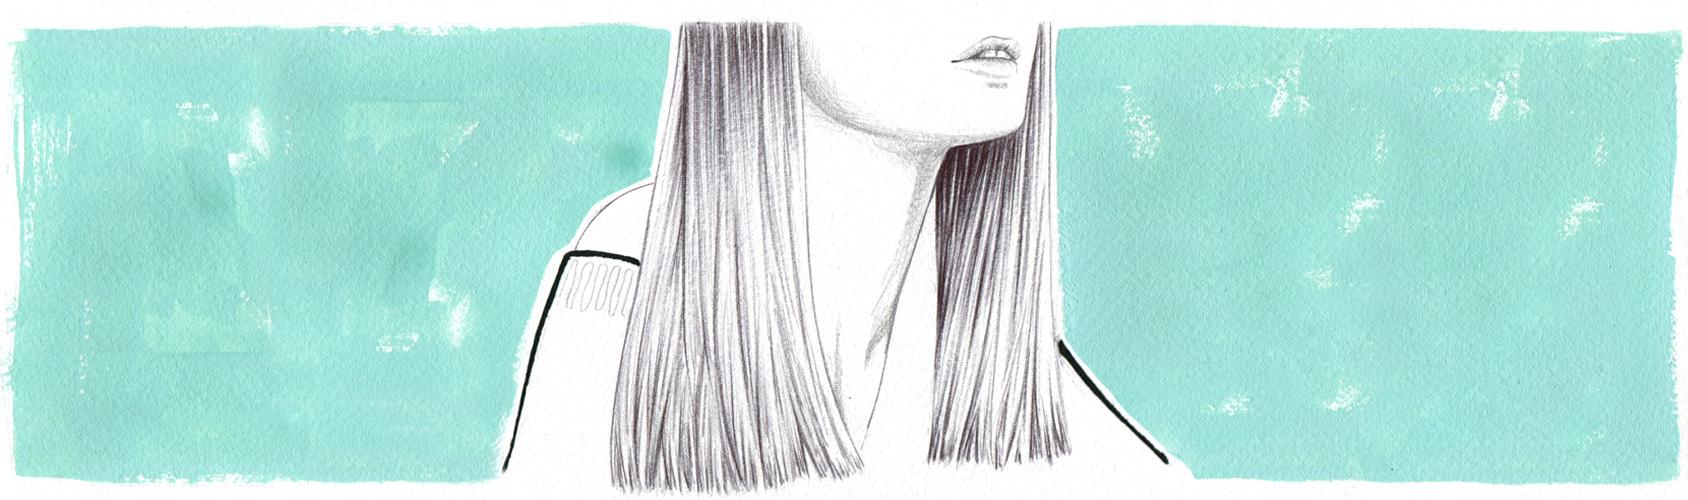 PIN-STRAIGHT HAIR